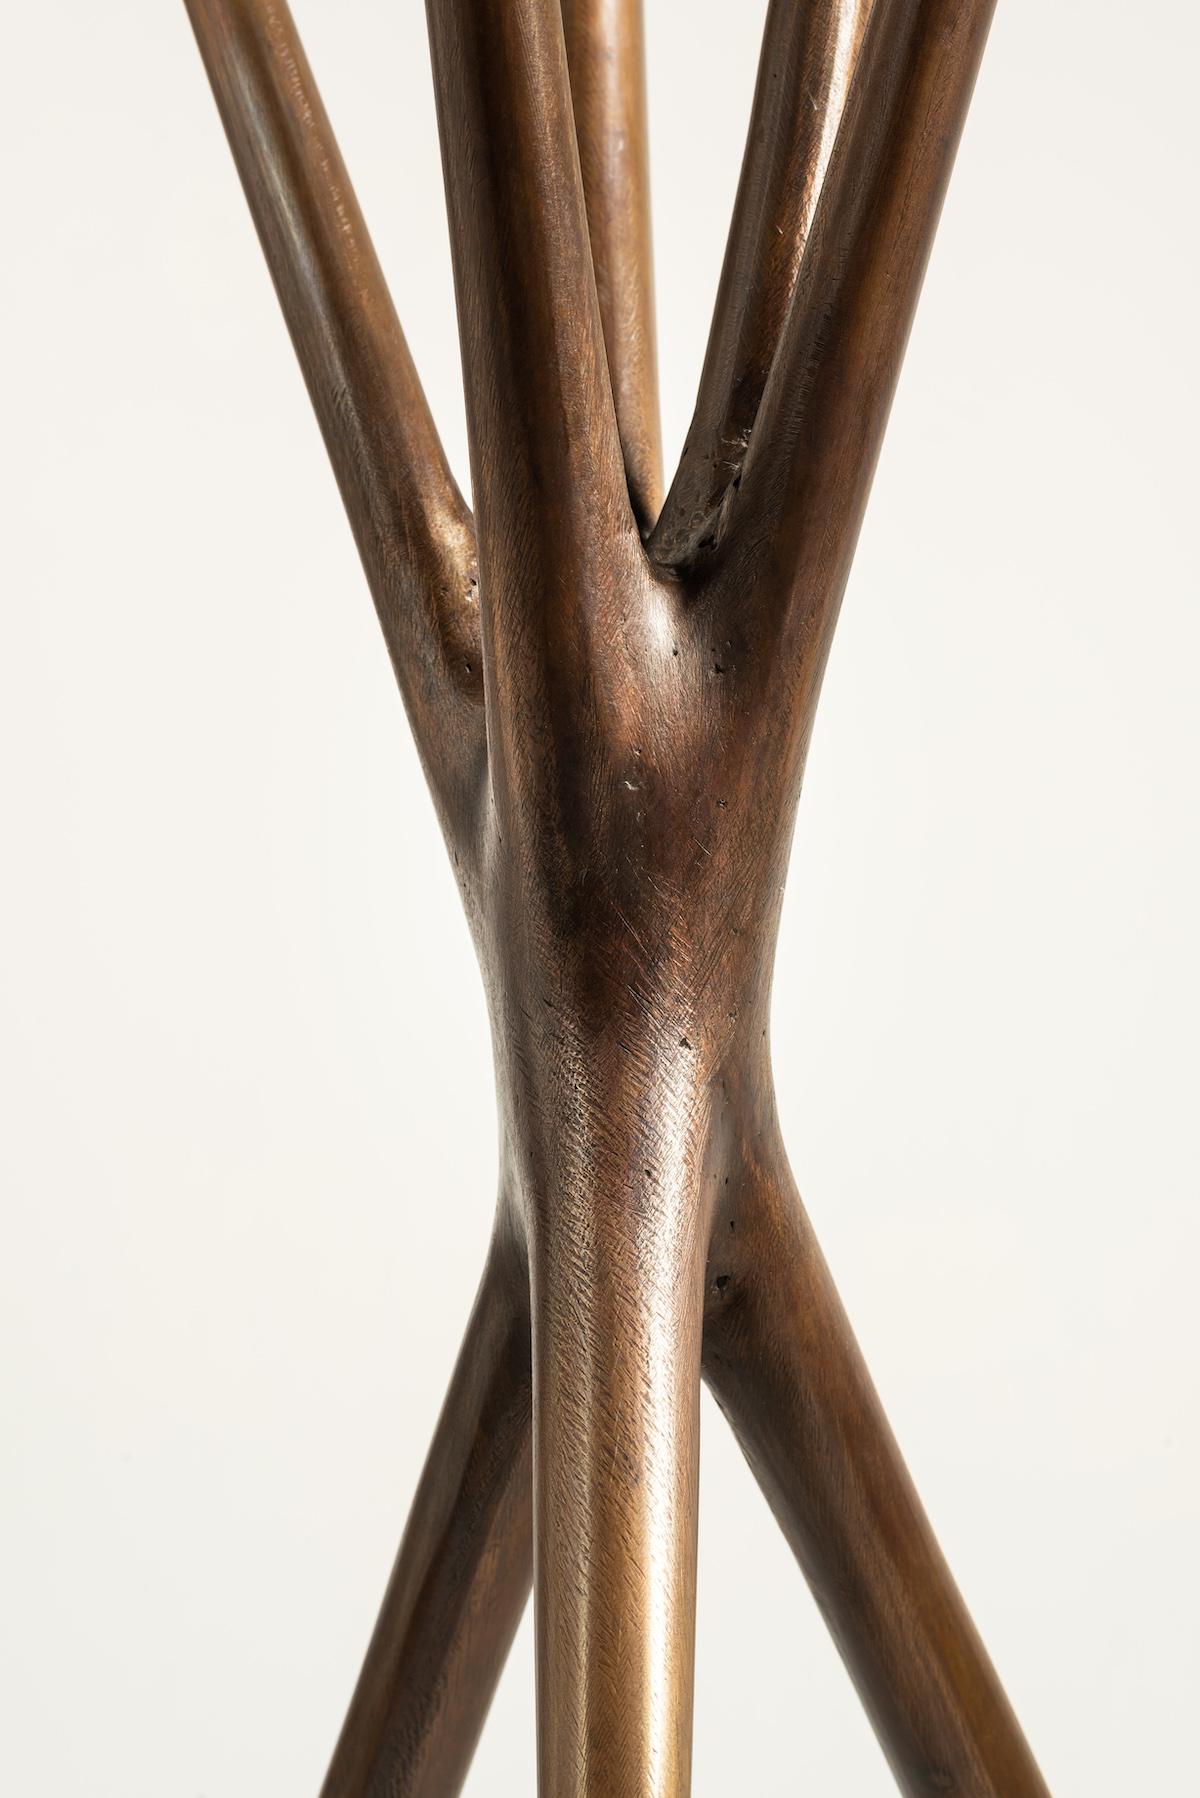 detail of Untitled (Standing Sculpture) by Christopher Kurtz